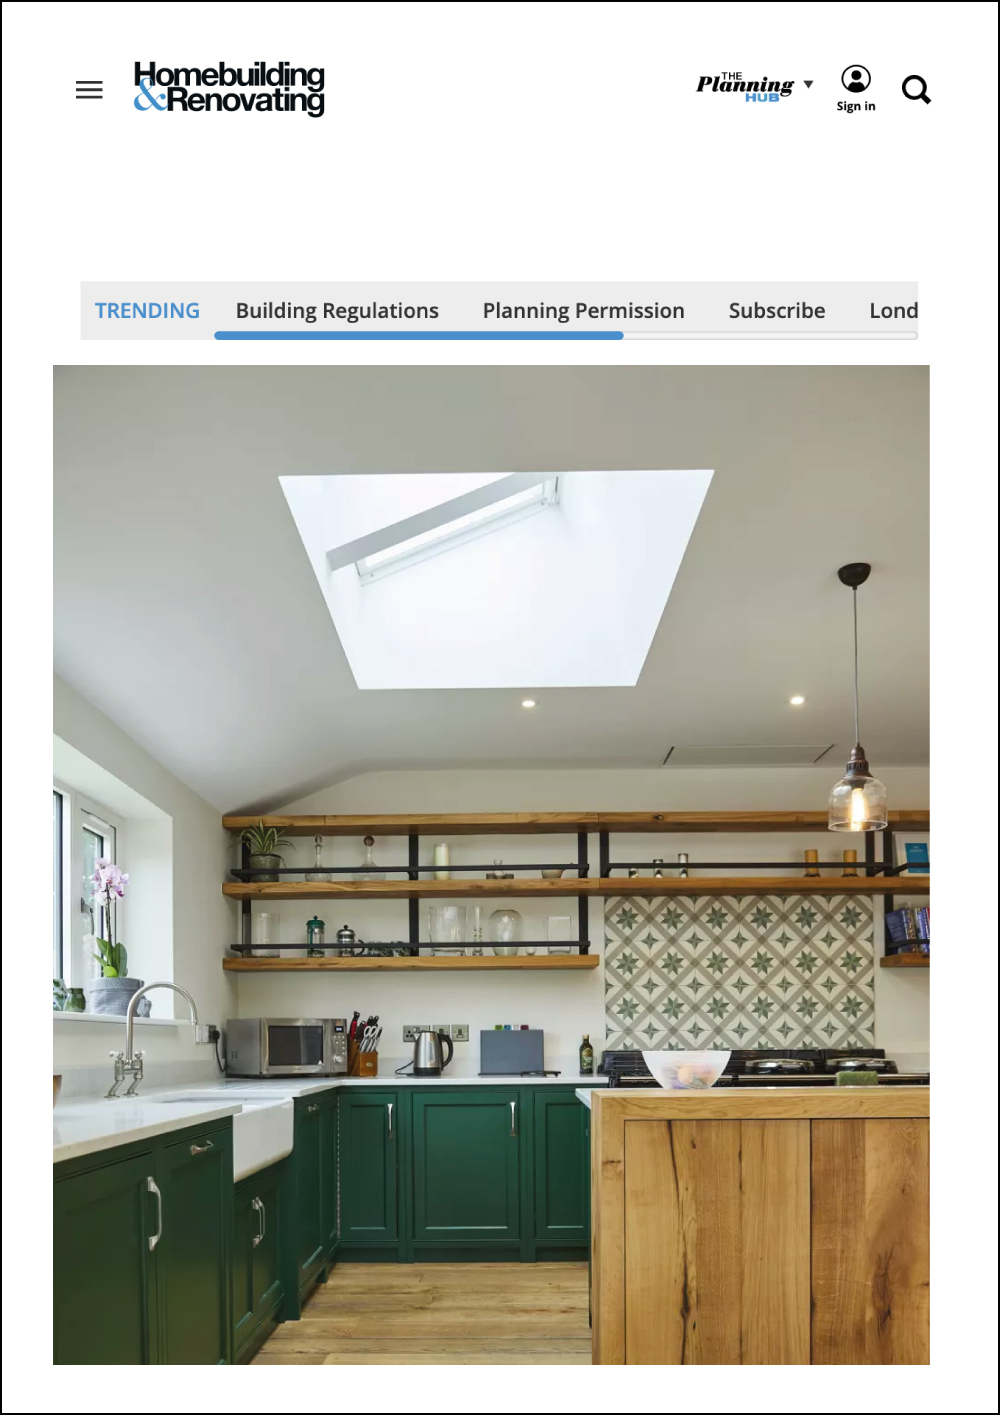 homebuilding and renovating